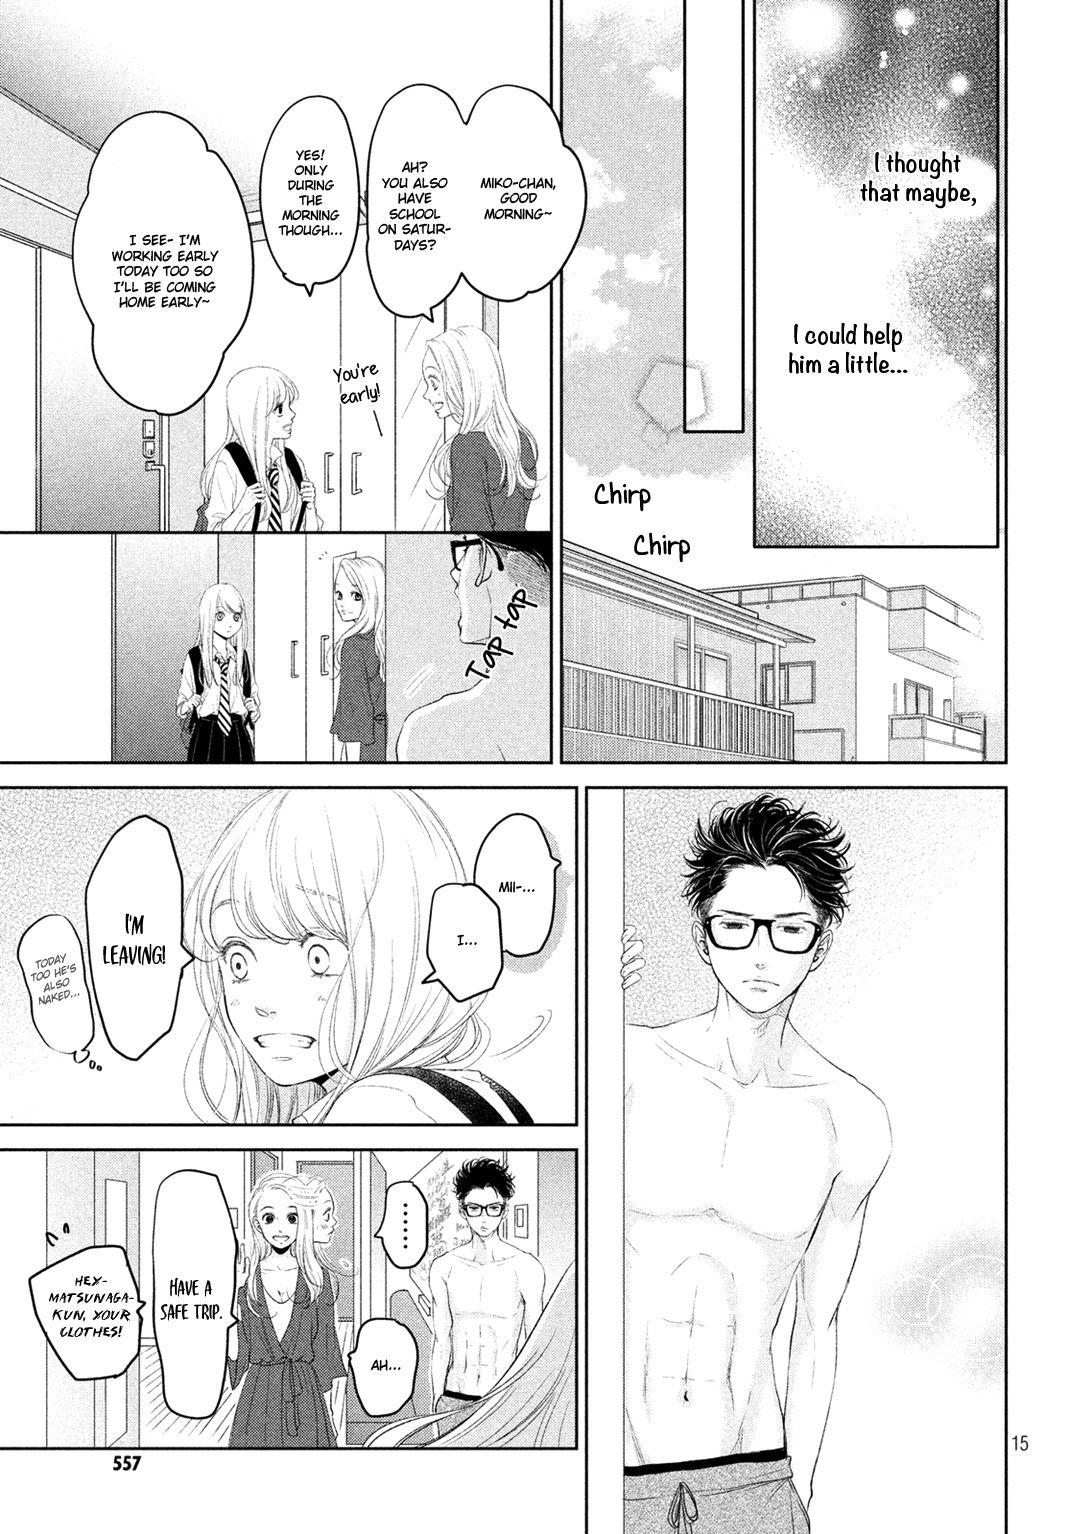 Read Manga Living No Matsunaga San Vol 001 Ch 003 Online In High Quality Anime Romance Manga To Read Manga Anime